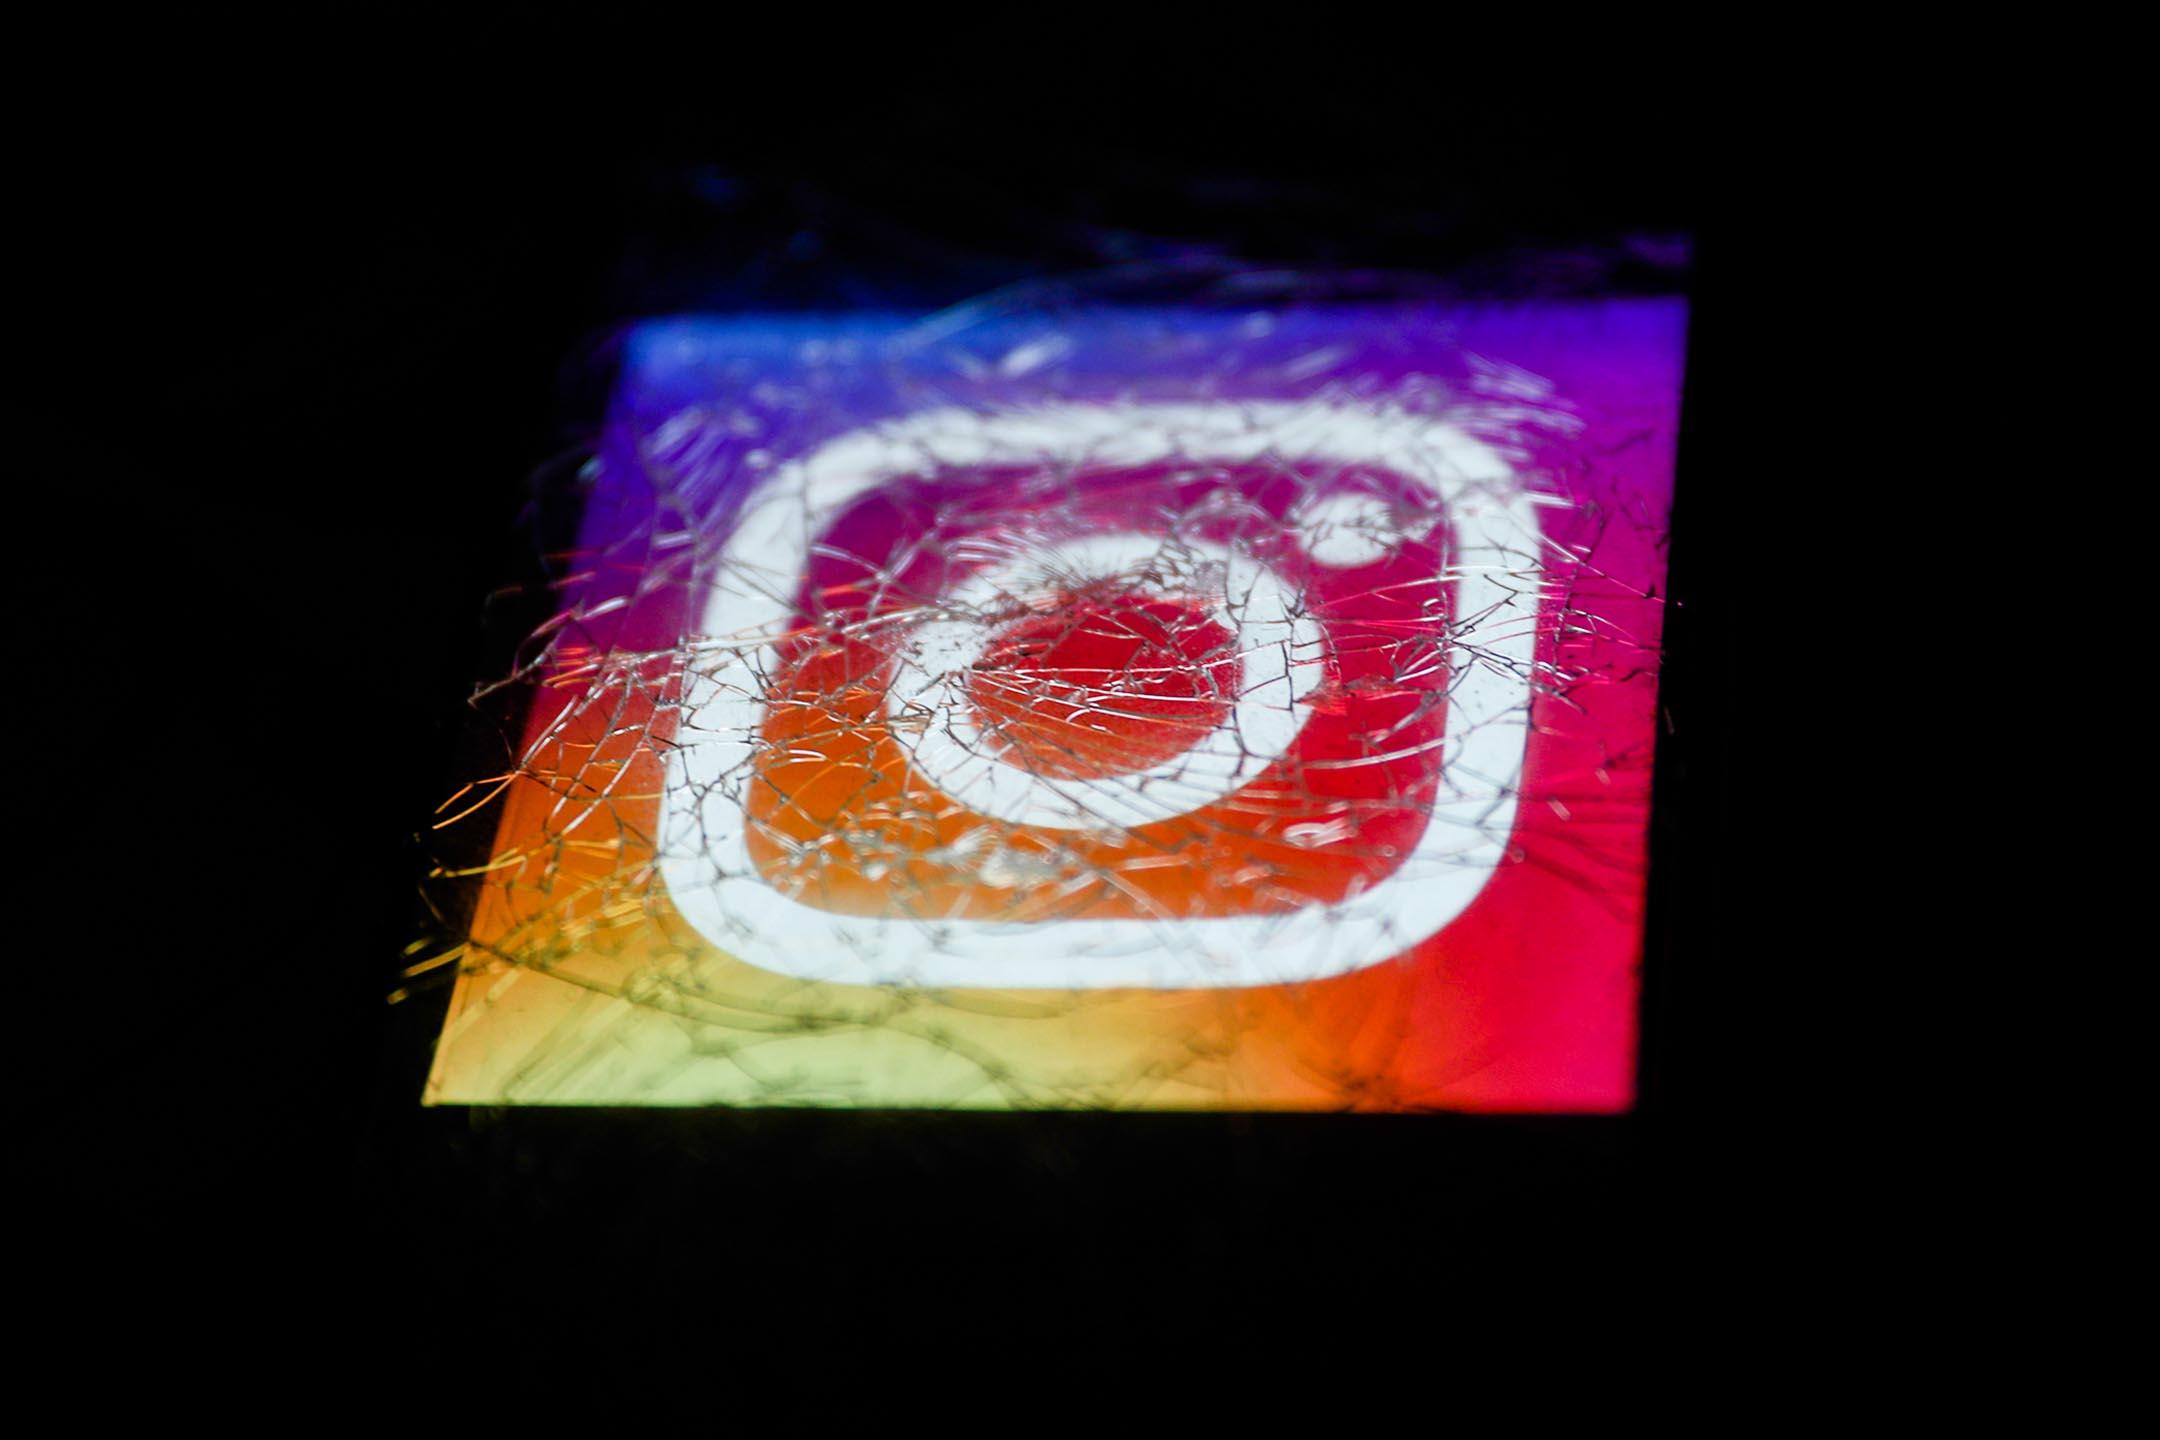 2020年2月28日波蘭,透過碎玻璃看到 Instagram 標誌。 攝:Jakub Porzycki/NurPhoto via Getty Images